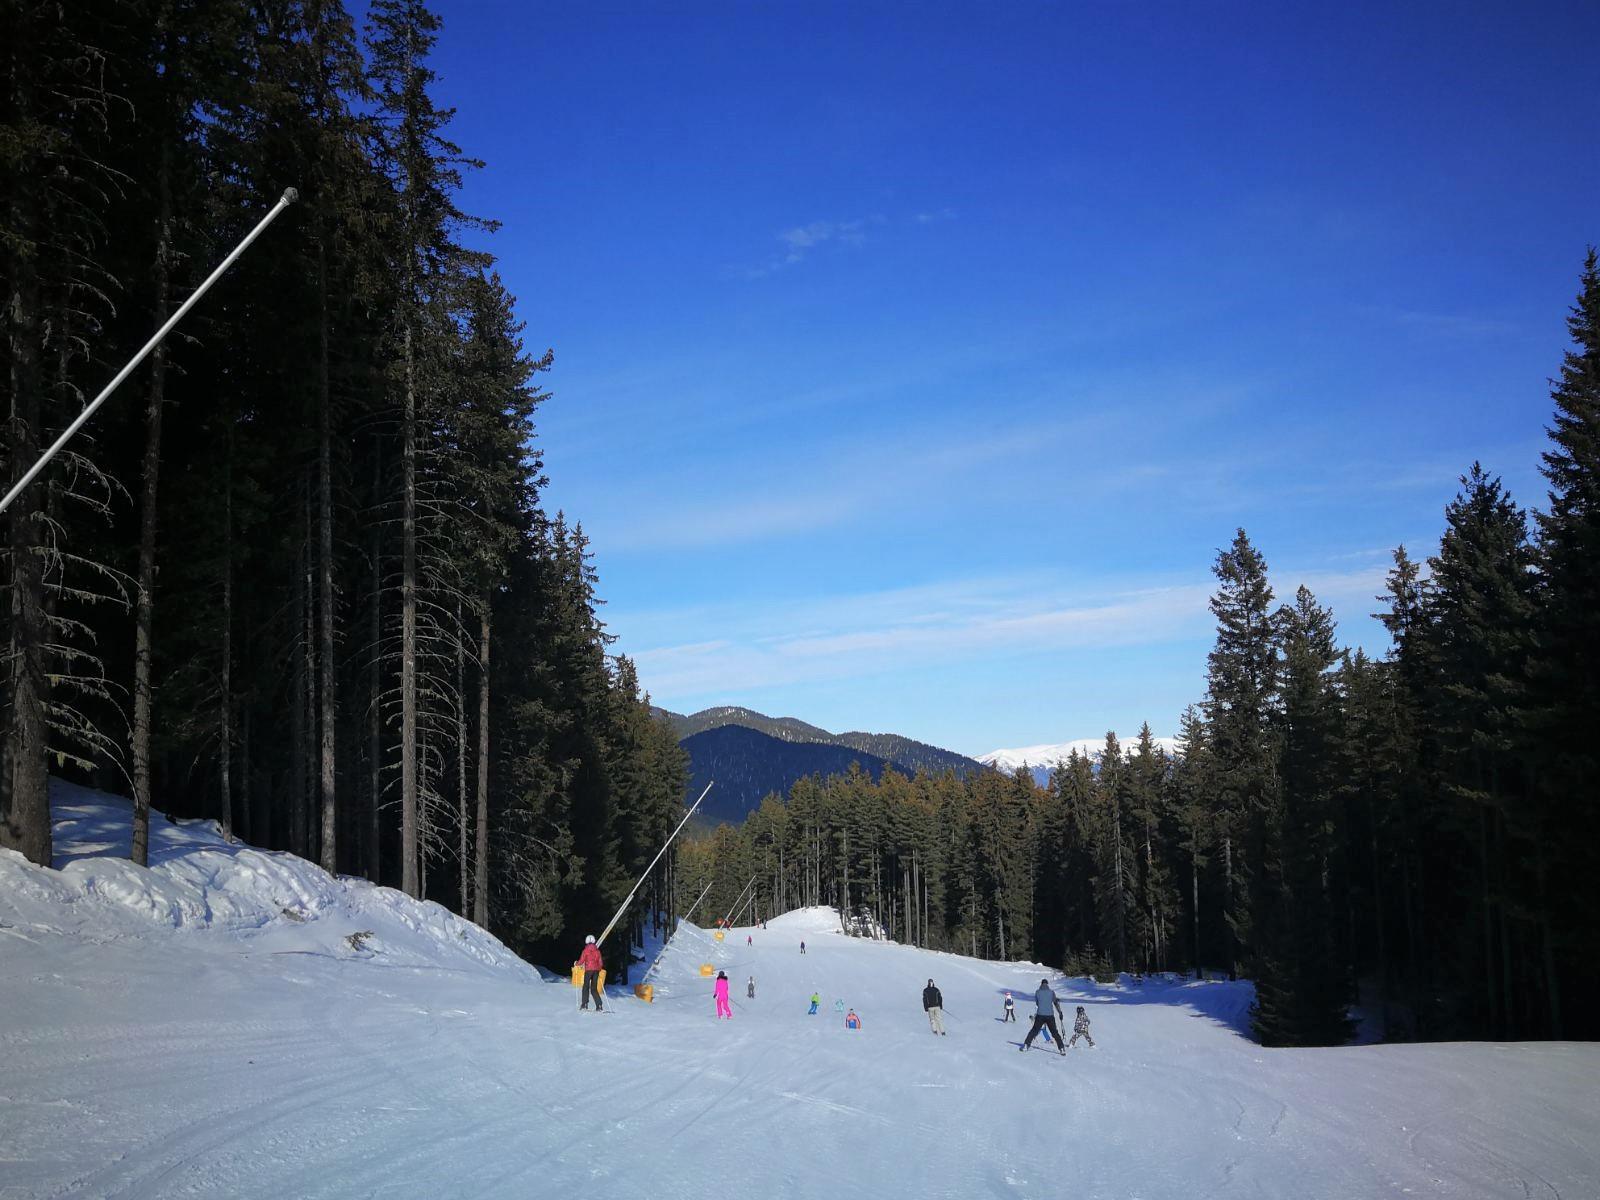 Ski Slope Shiligarnik 2